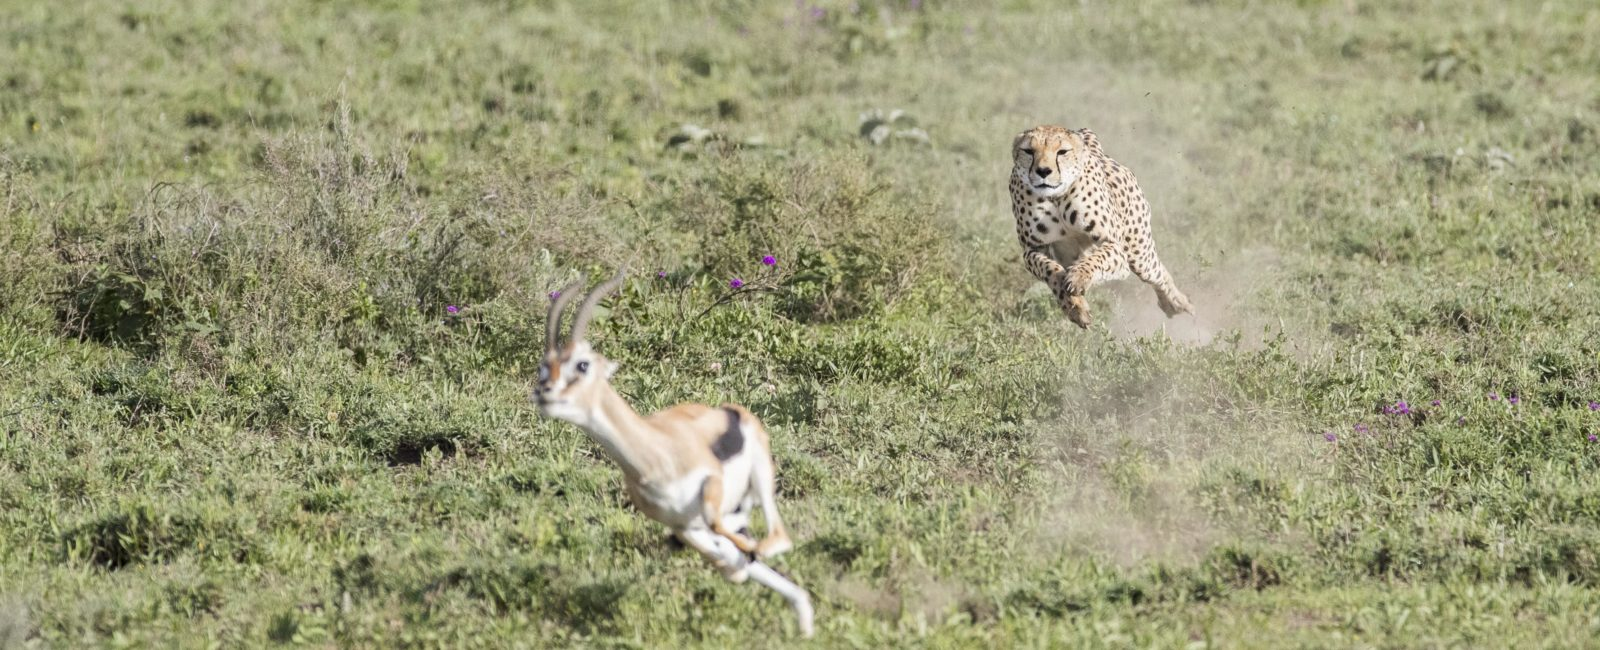 Cheetah, chase, hunting, running, full speed, safari, tanzania